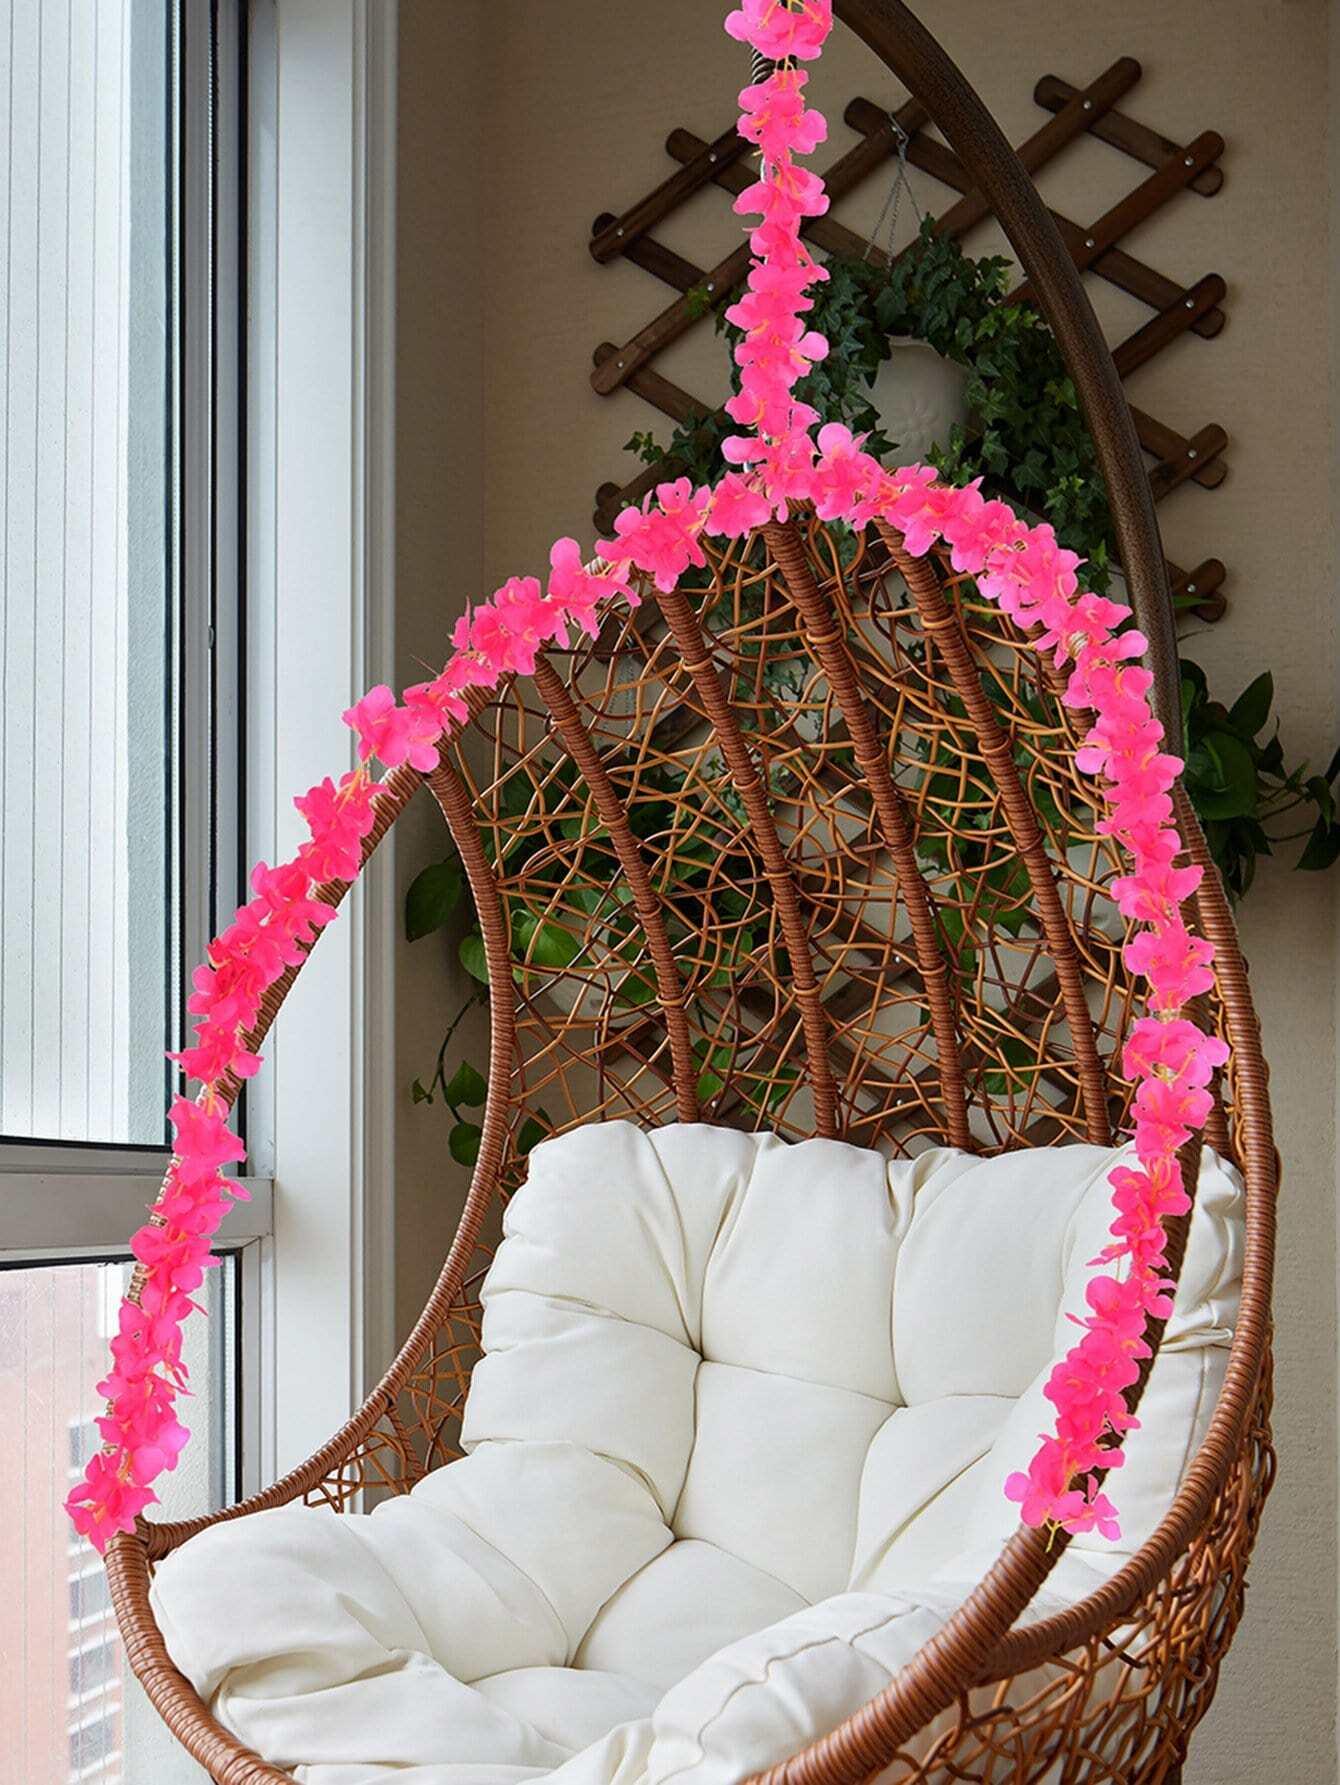 Artificial Flowers Vine 1pc 200cm decorative wreaths flowers vine garland leaf